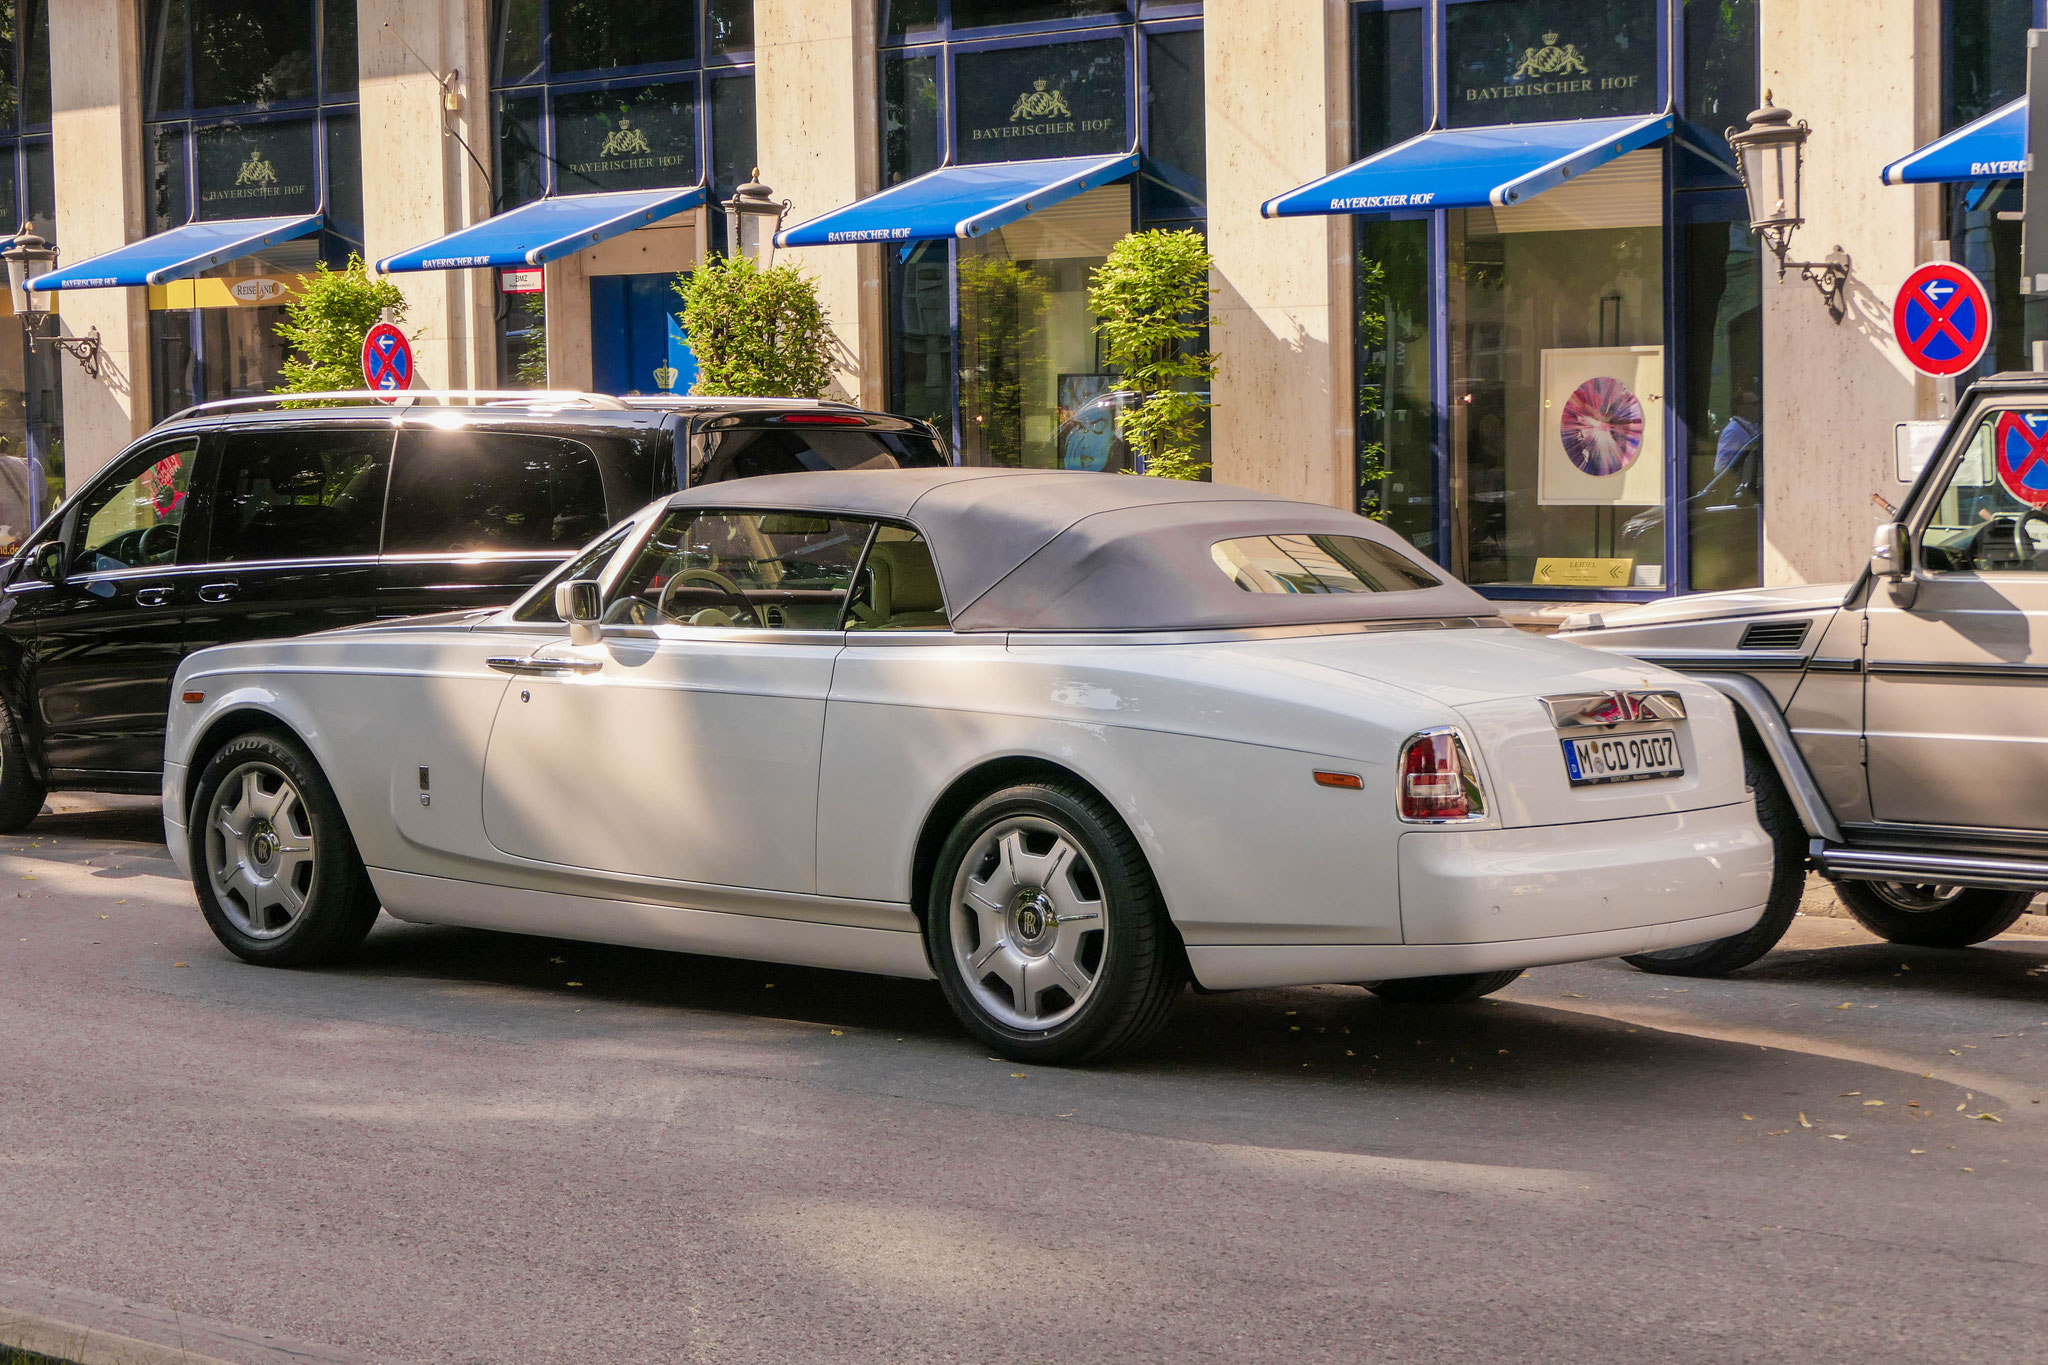 Rolls Royce Drophead - M-CD-9007